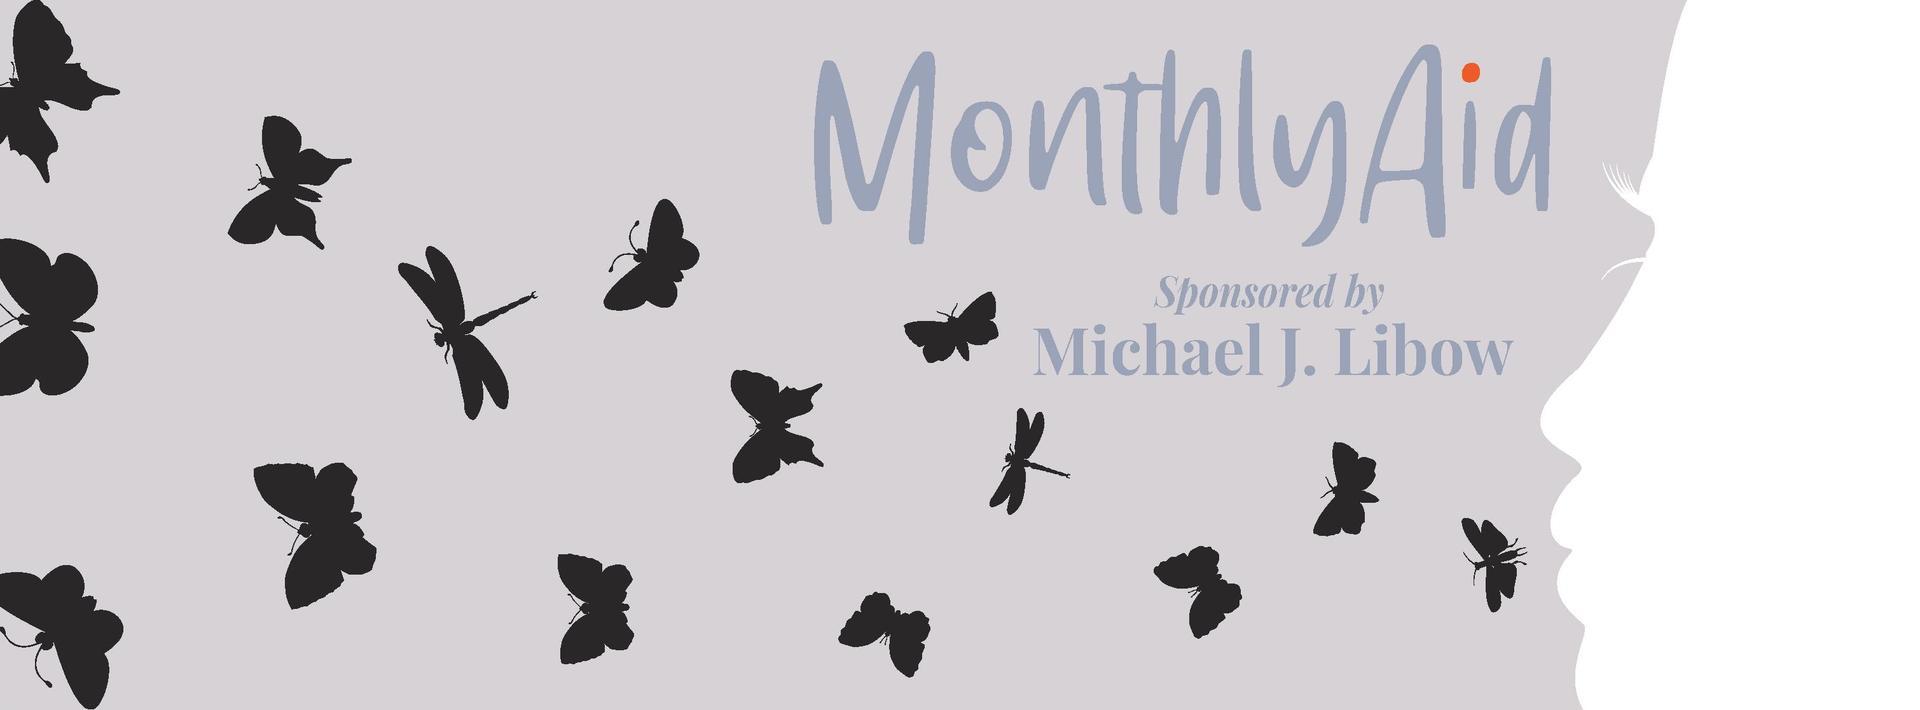 MonthlyAid